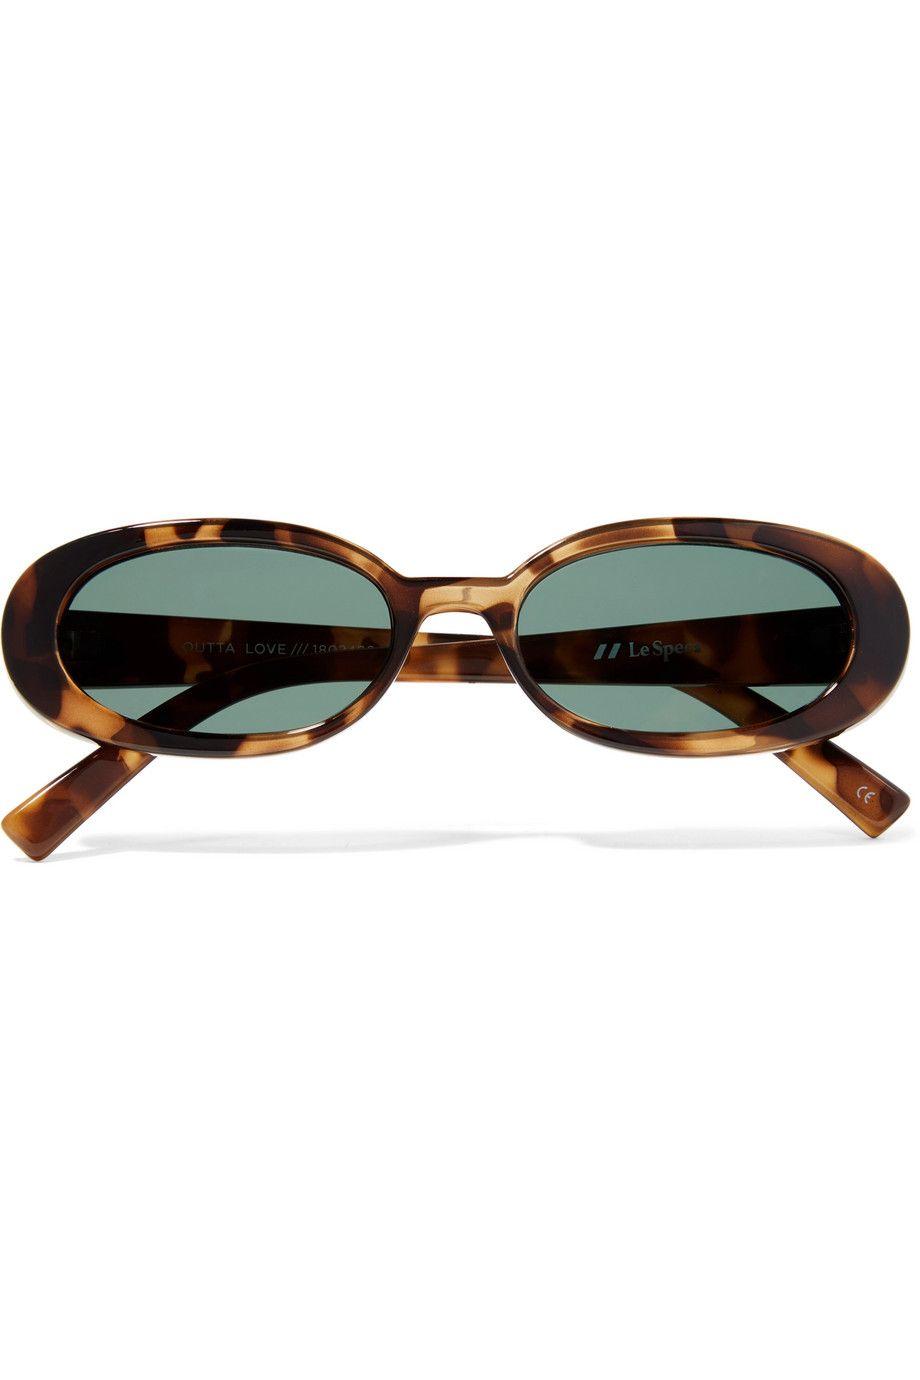 Outta Love oval-frame tortoiseshell acetate sunglasses